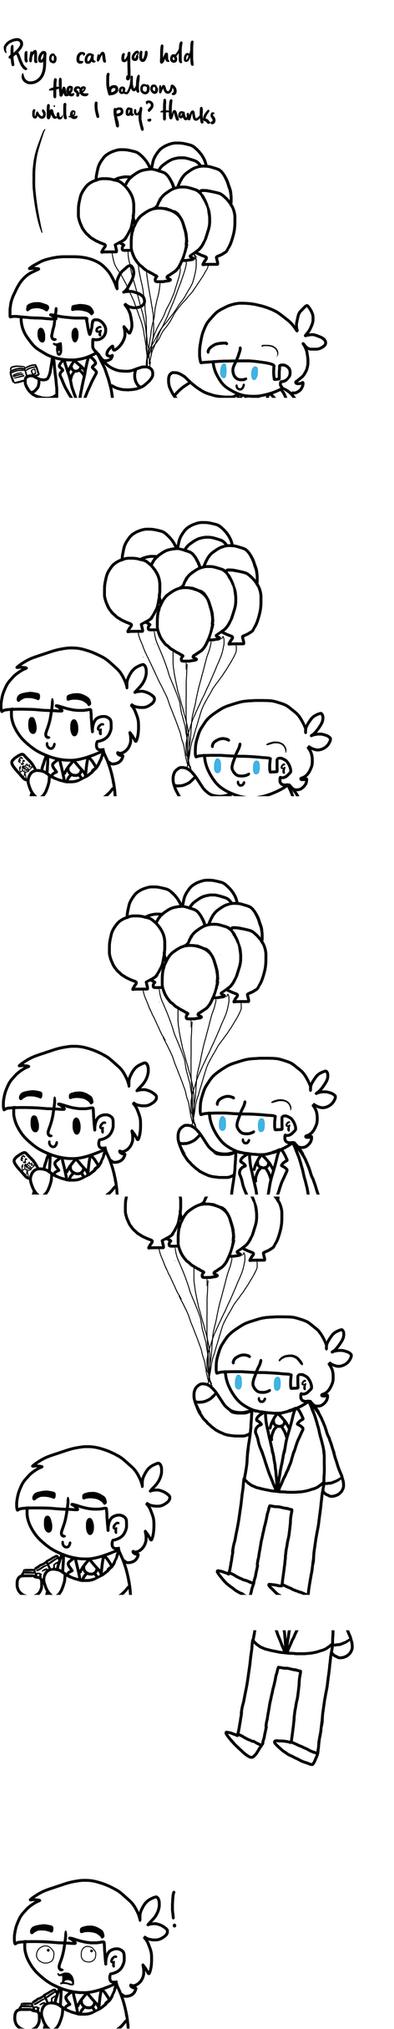 Balloons by ChazzyLlama